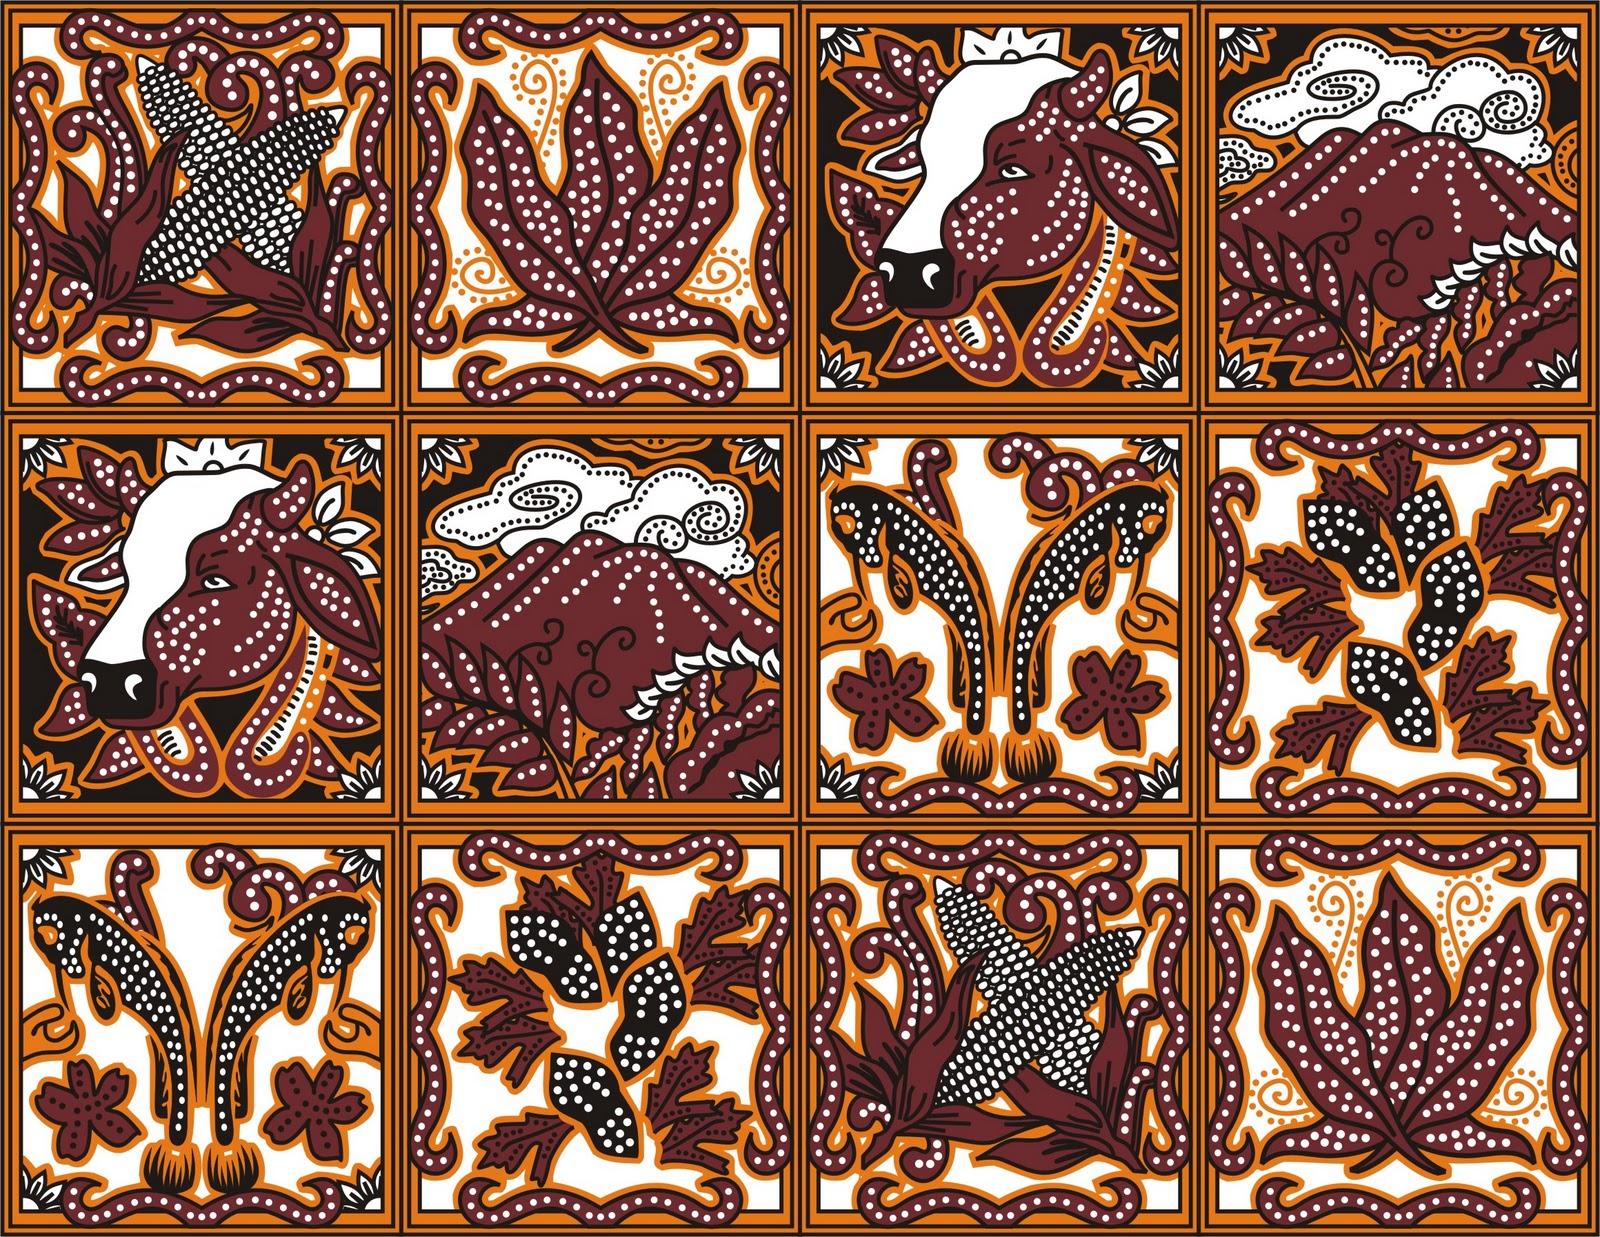 Desain Batik dari Kabupaten Boyolali ~ xomixu